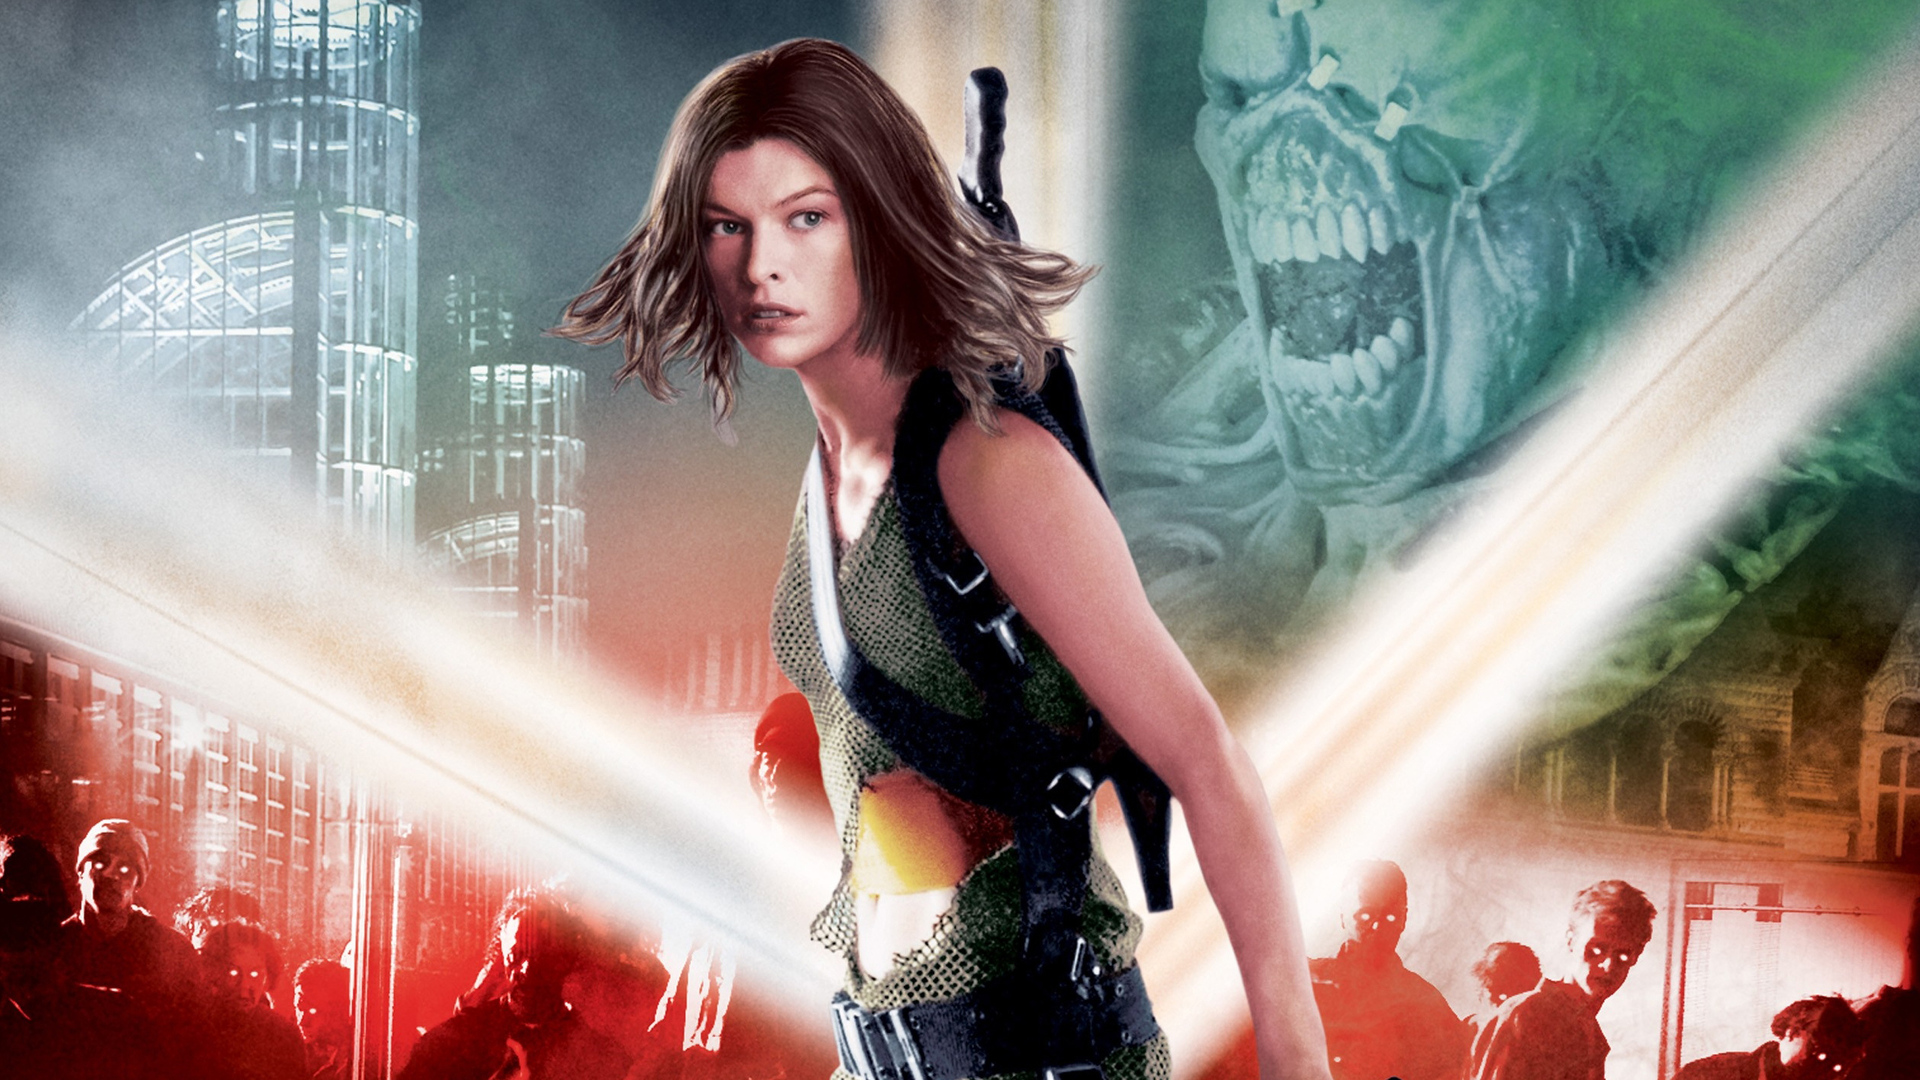 1920x1080 Resident Evil Apocalypse Laptop Full HD 1080P HD ...